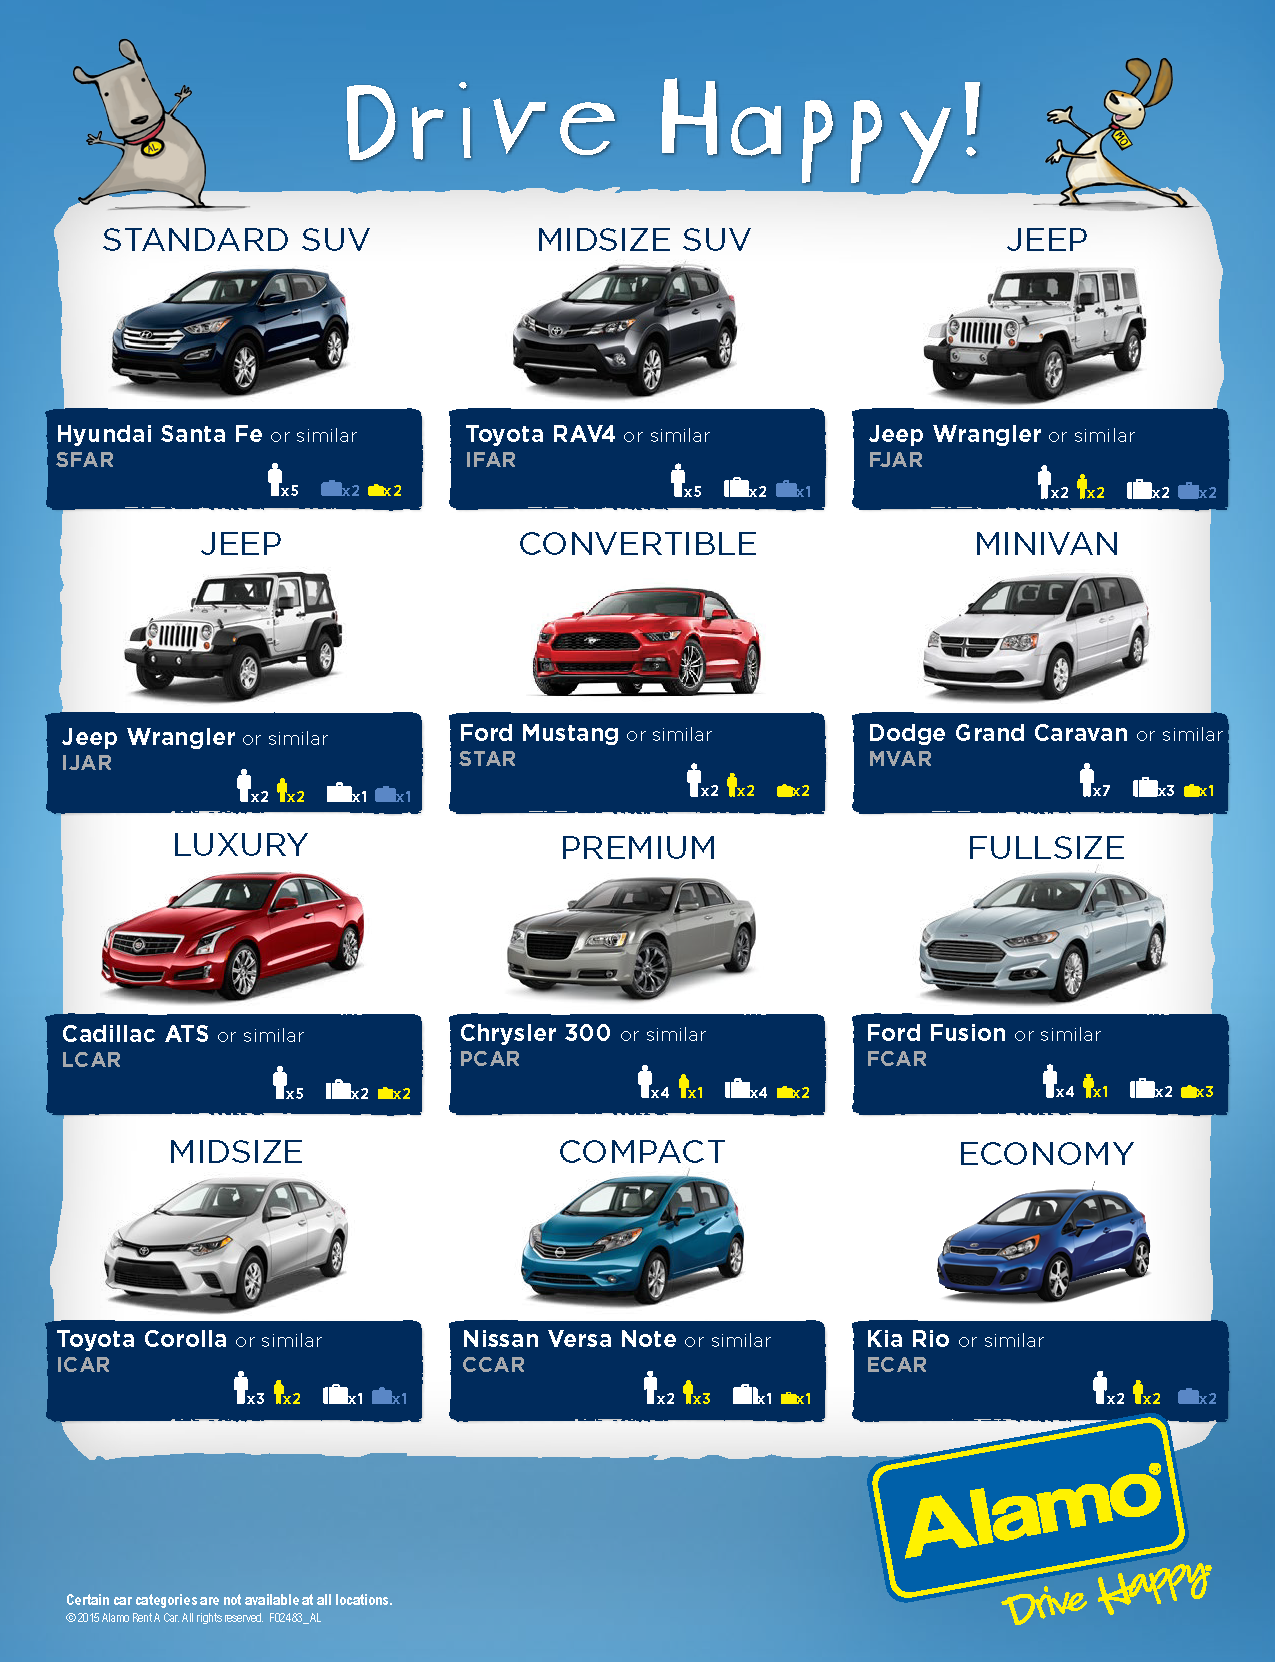 2015 Alamo Fleet Guide FINAL